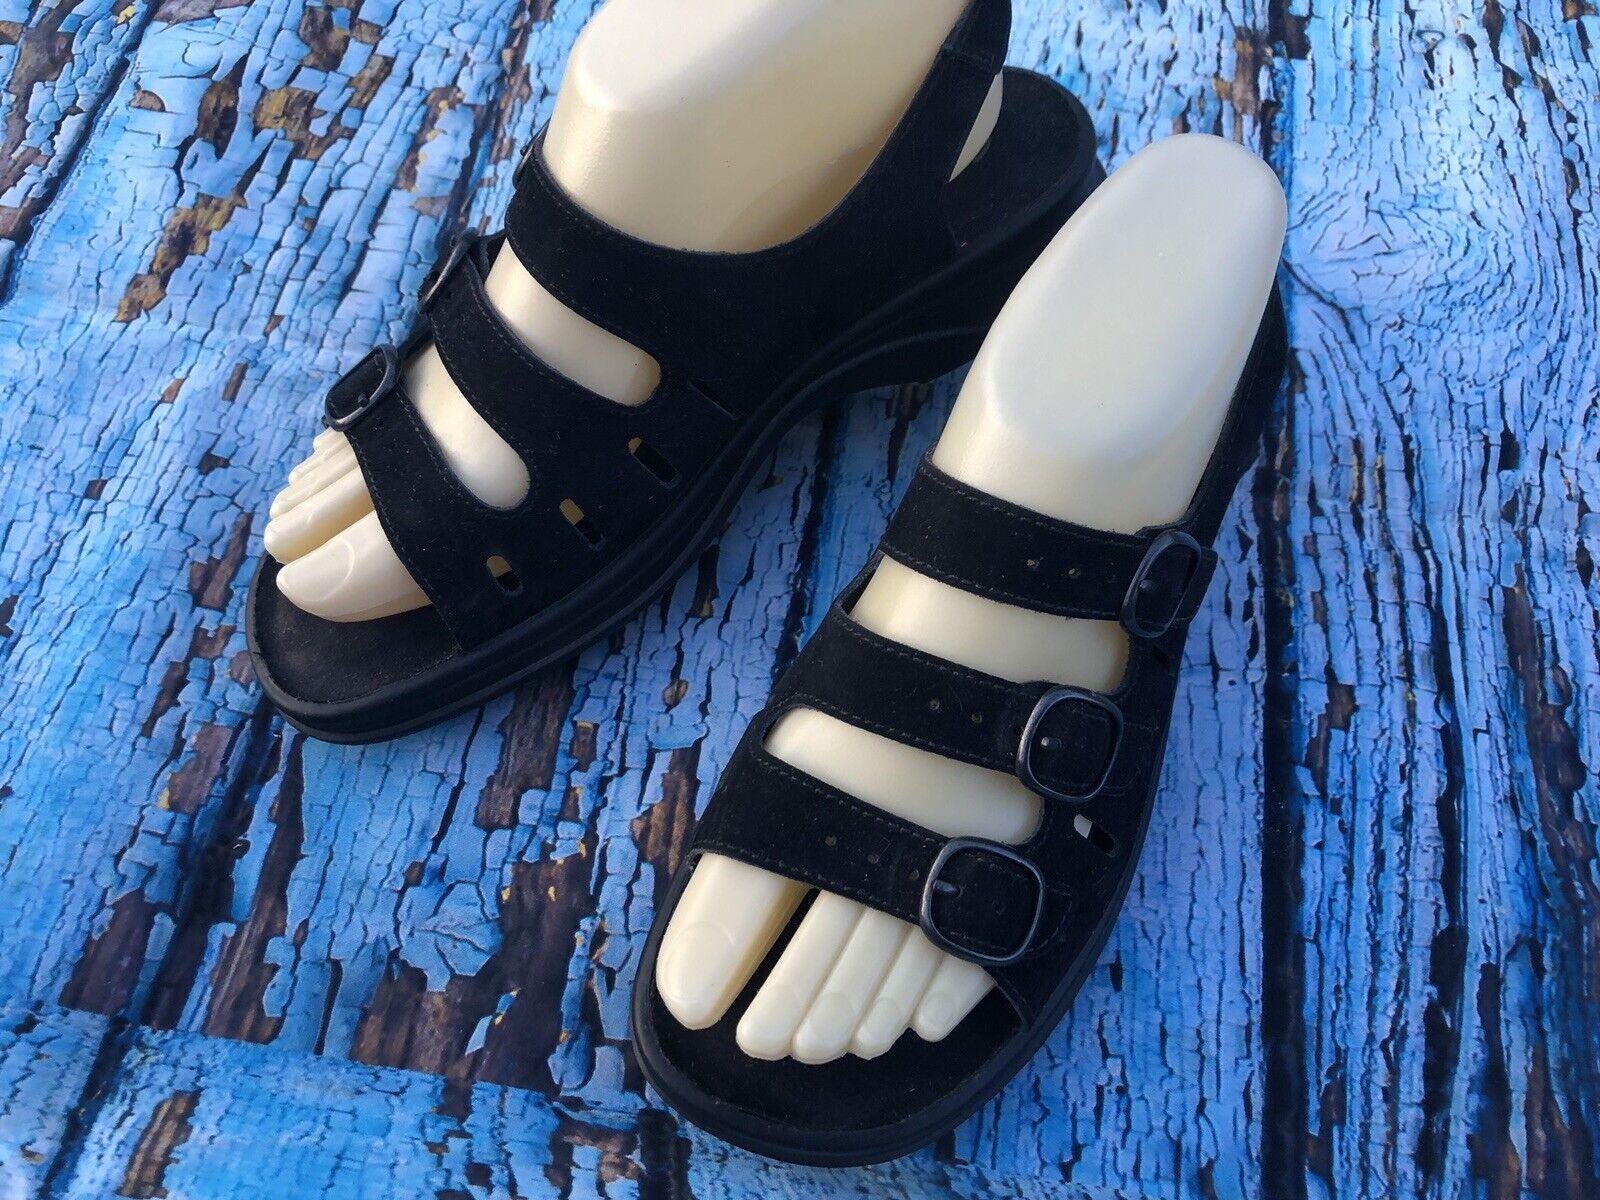 CLARKS SPRINGERS Size 7.5 M Black Nubuck Leather Comfort Sandals Cushioned